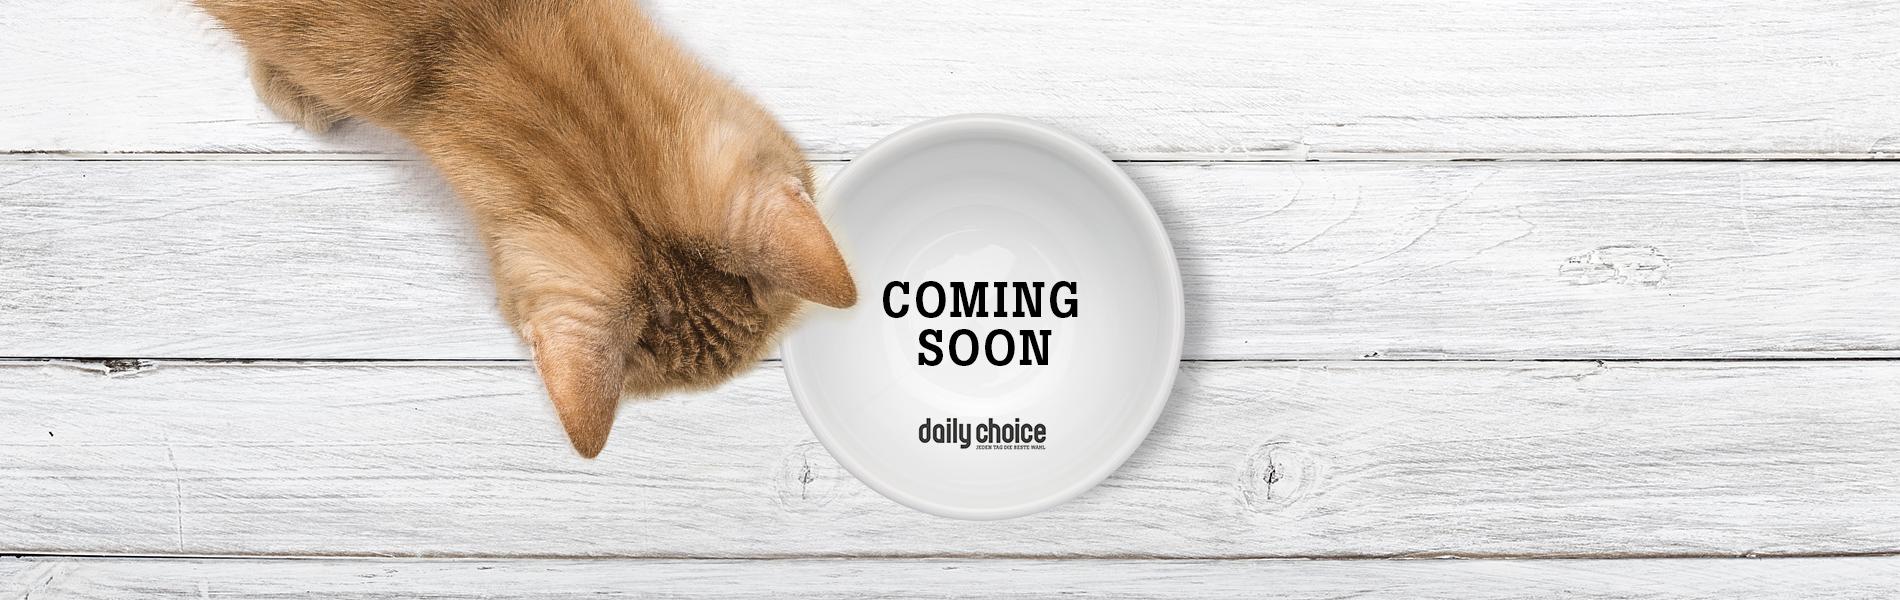 daily choice Katzenfutter coming soon